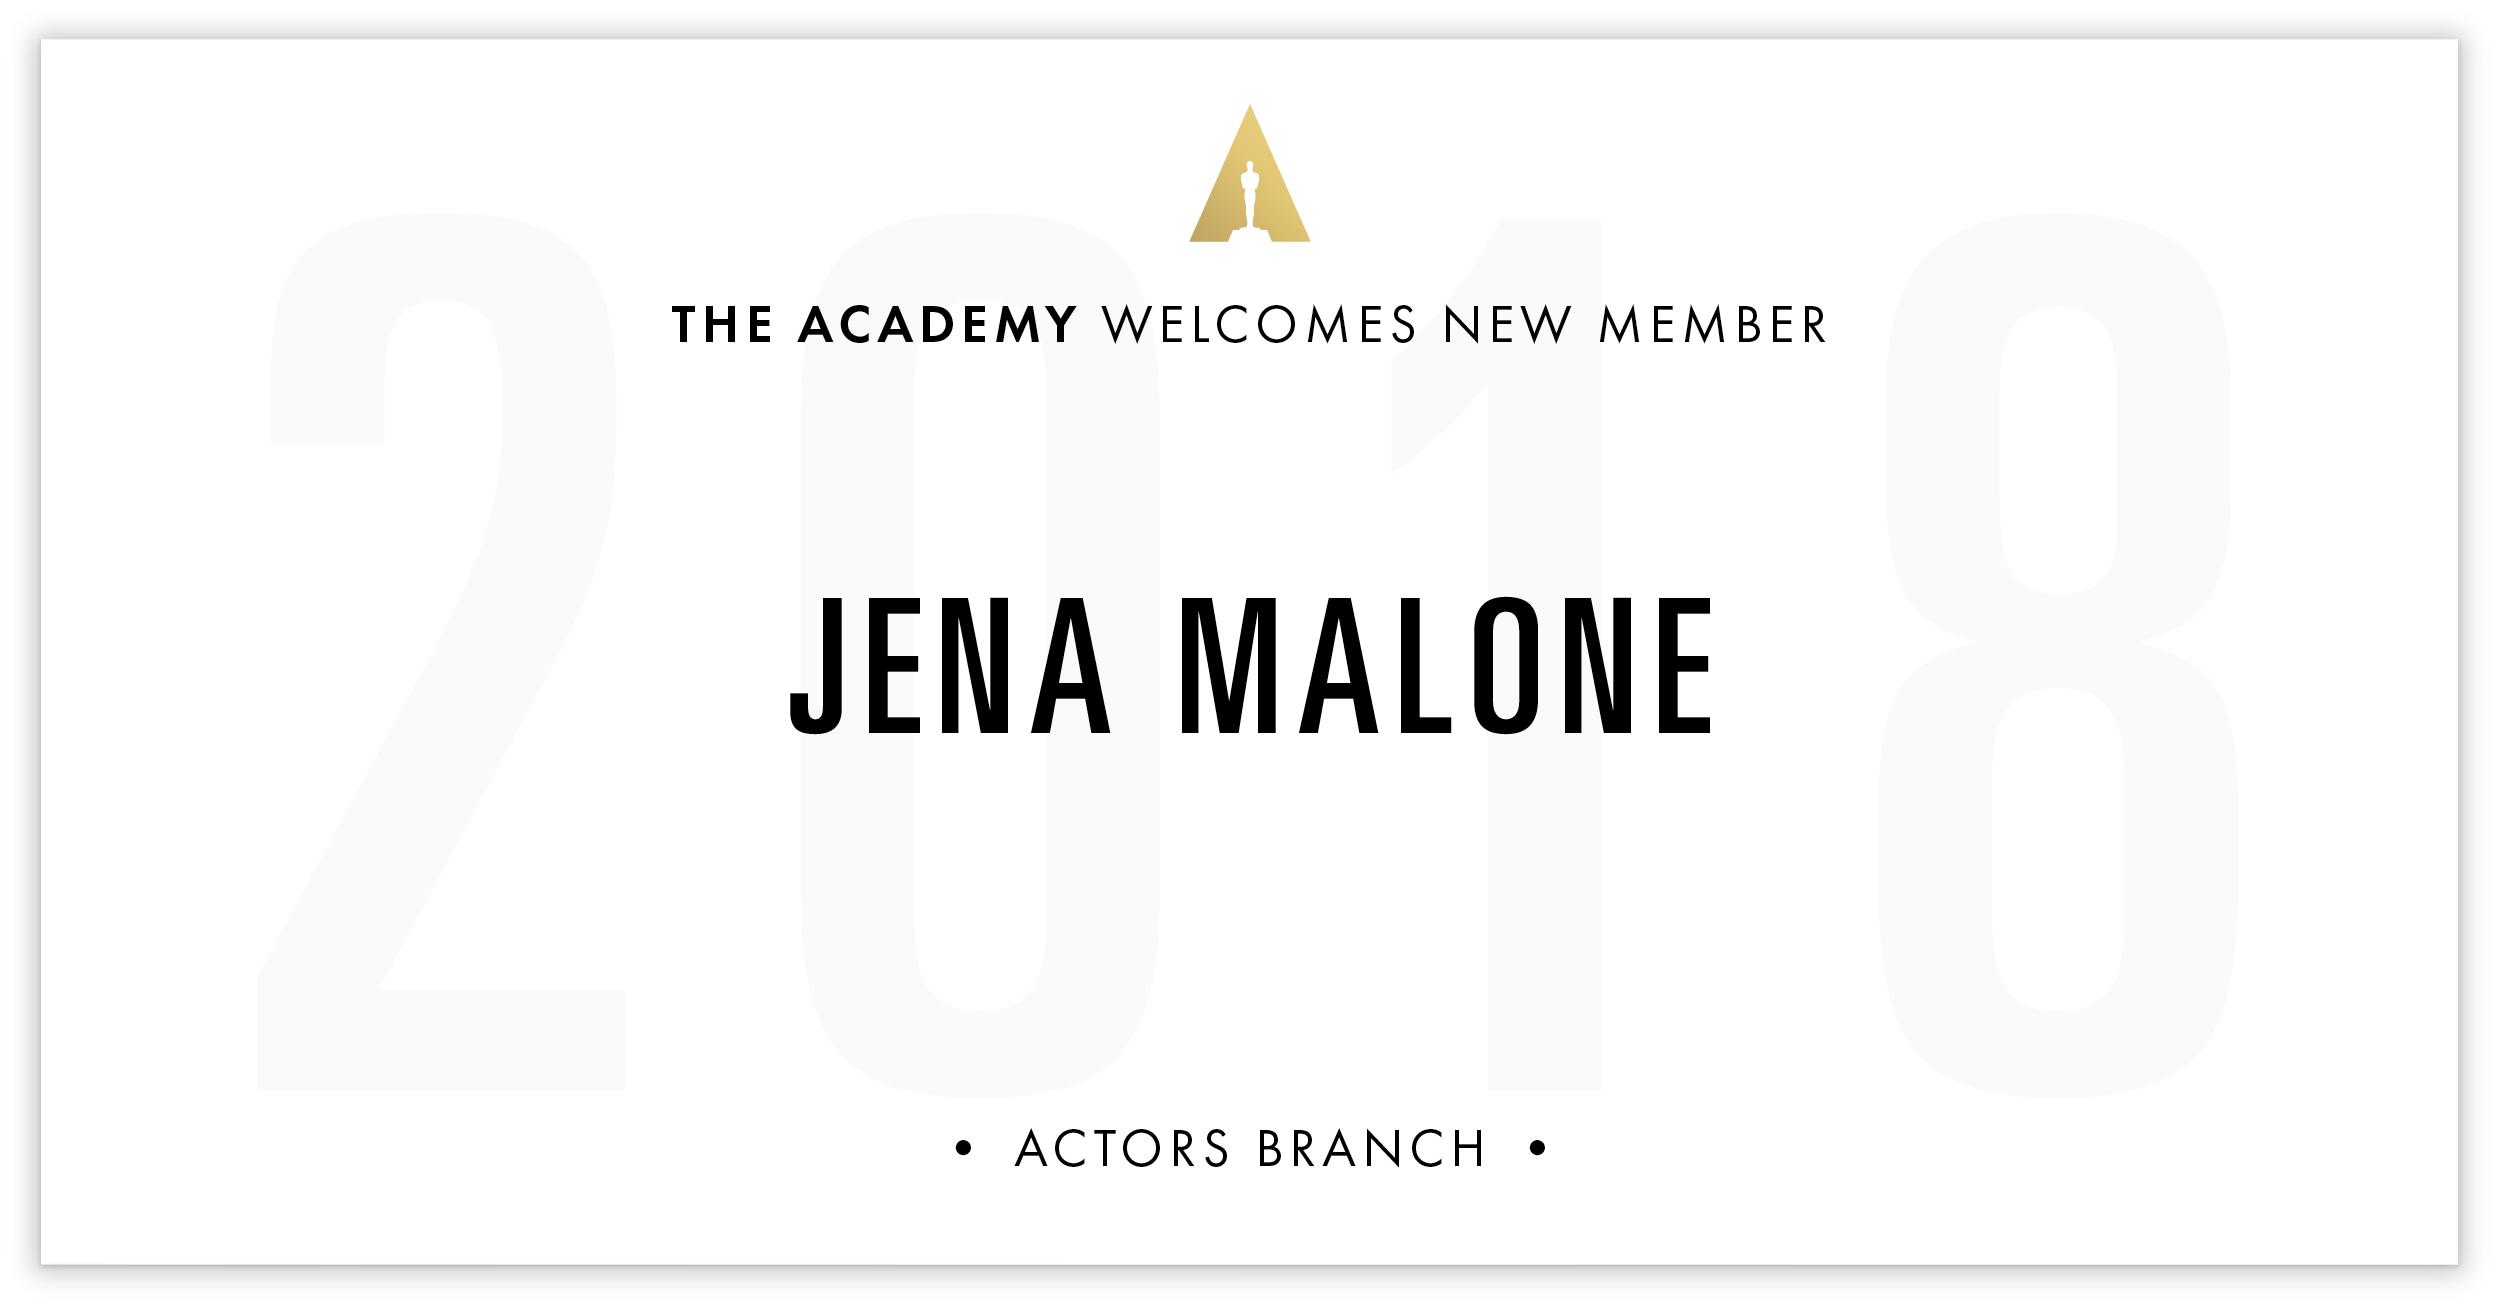 Jena Malone is invited!